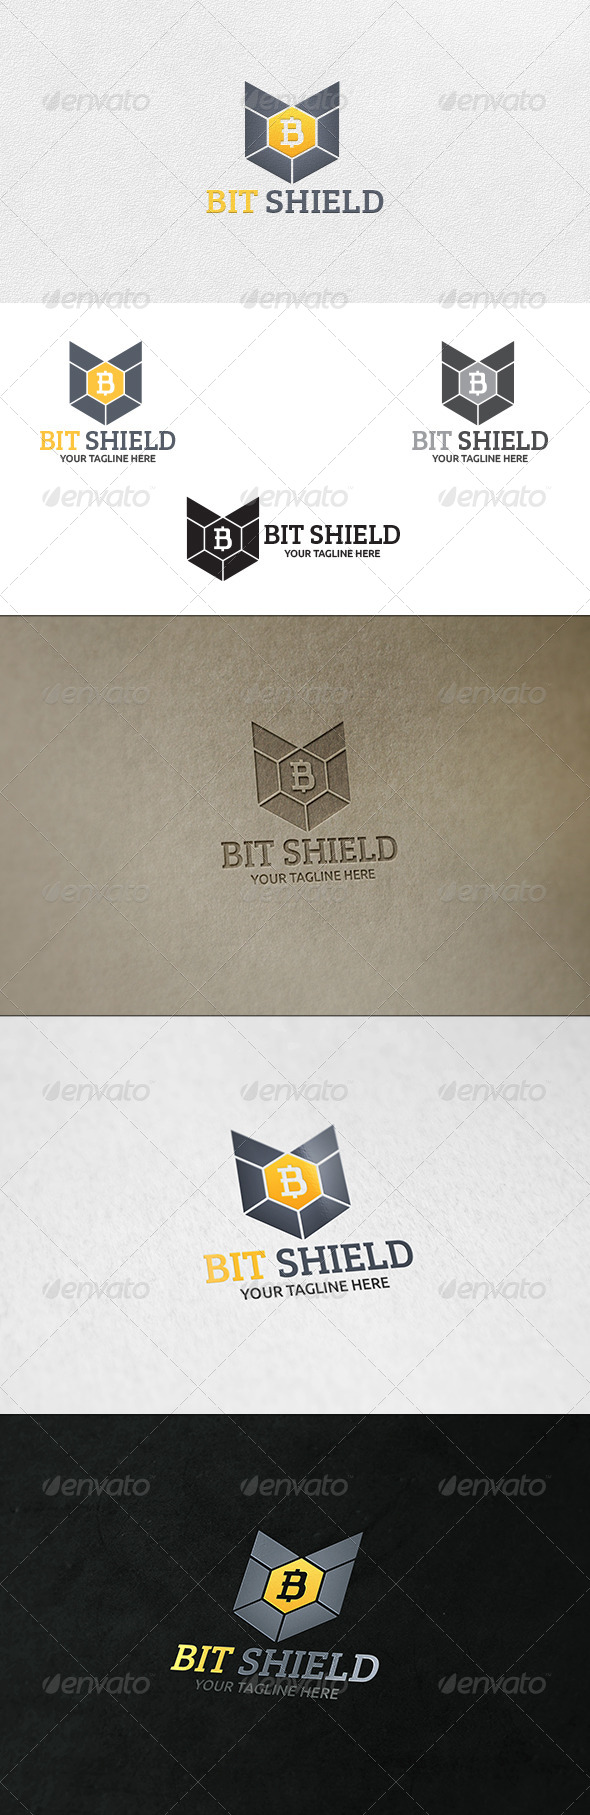 Bit Shield Logo Template